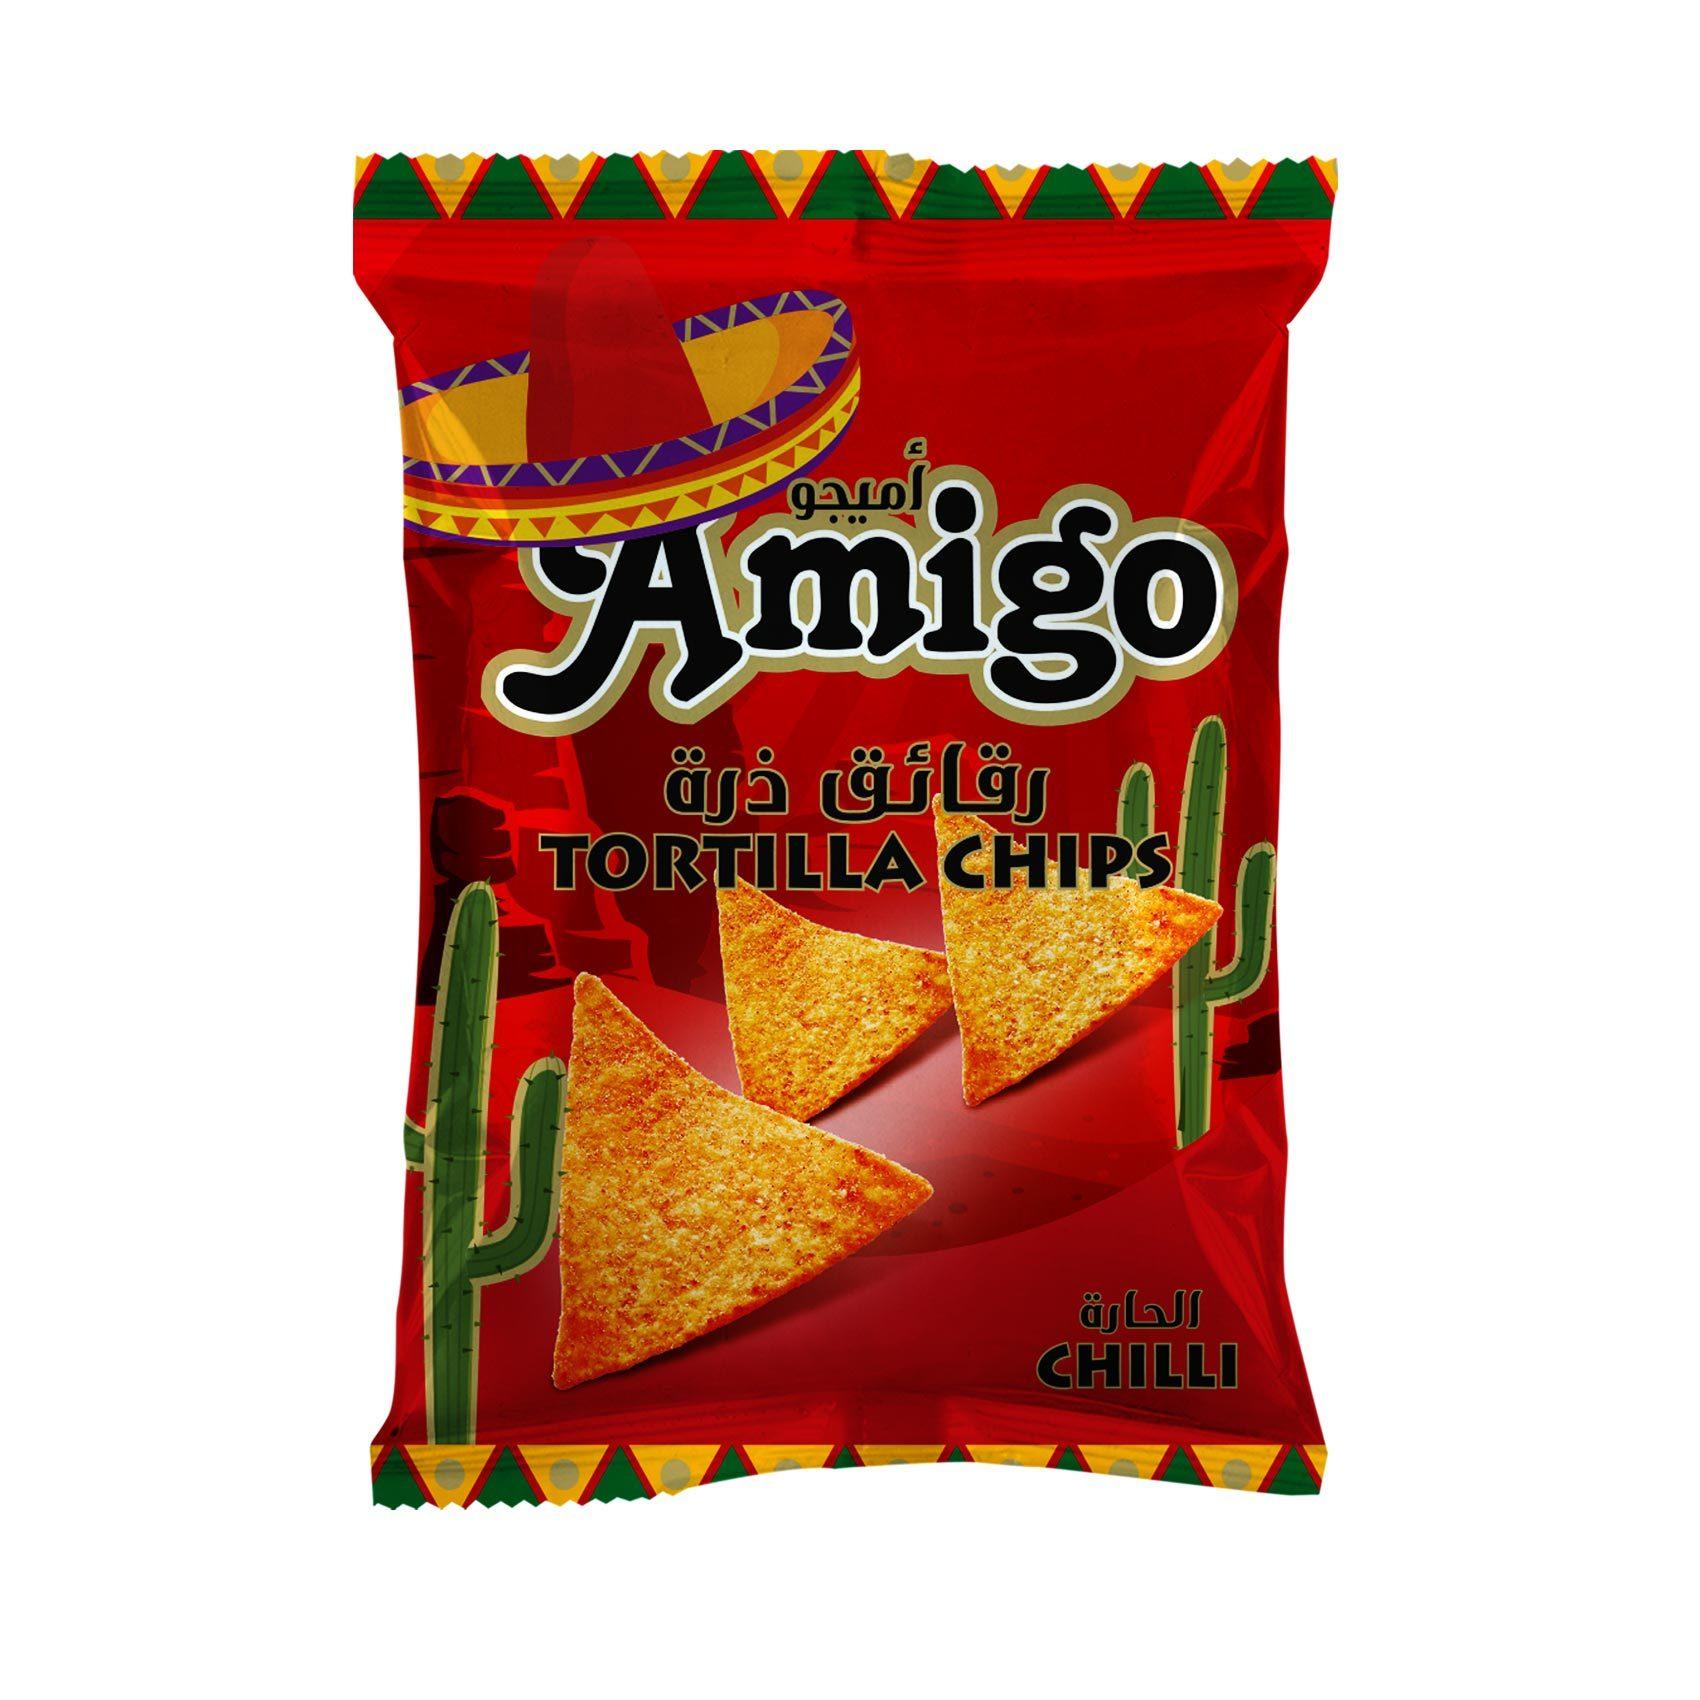 AMIGO TORTILLA CHILI 100GR